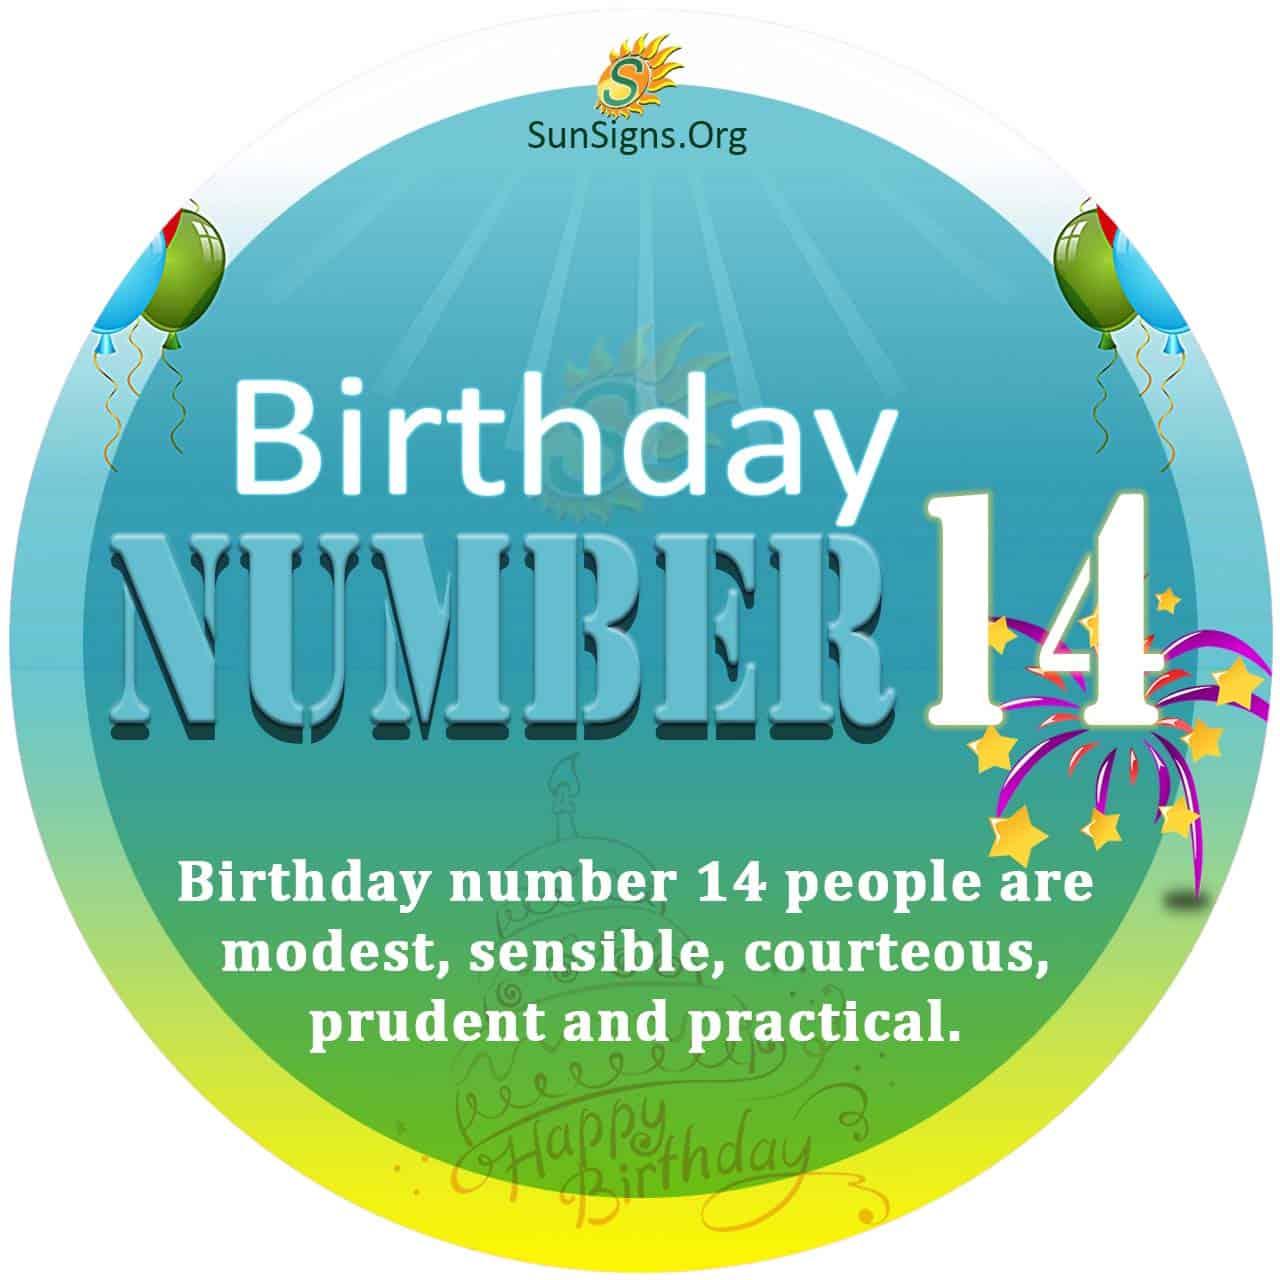 Birthday Number 14